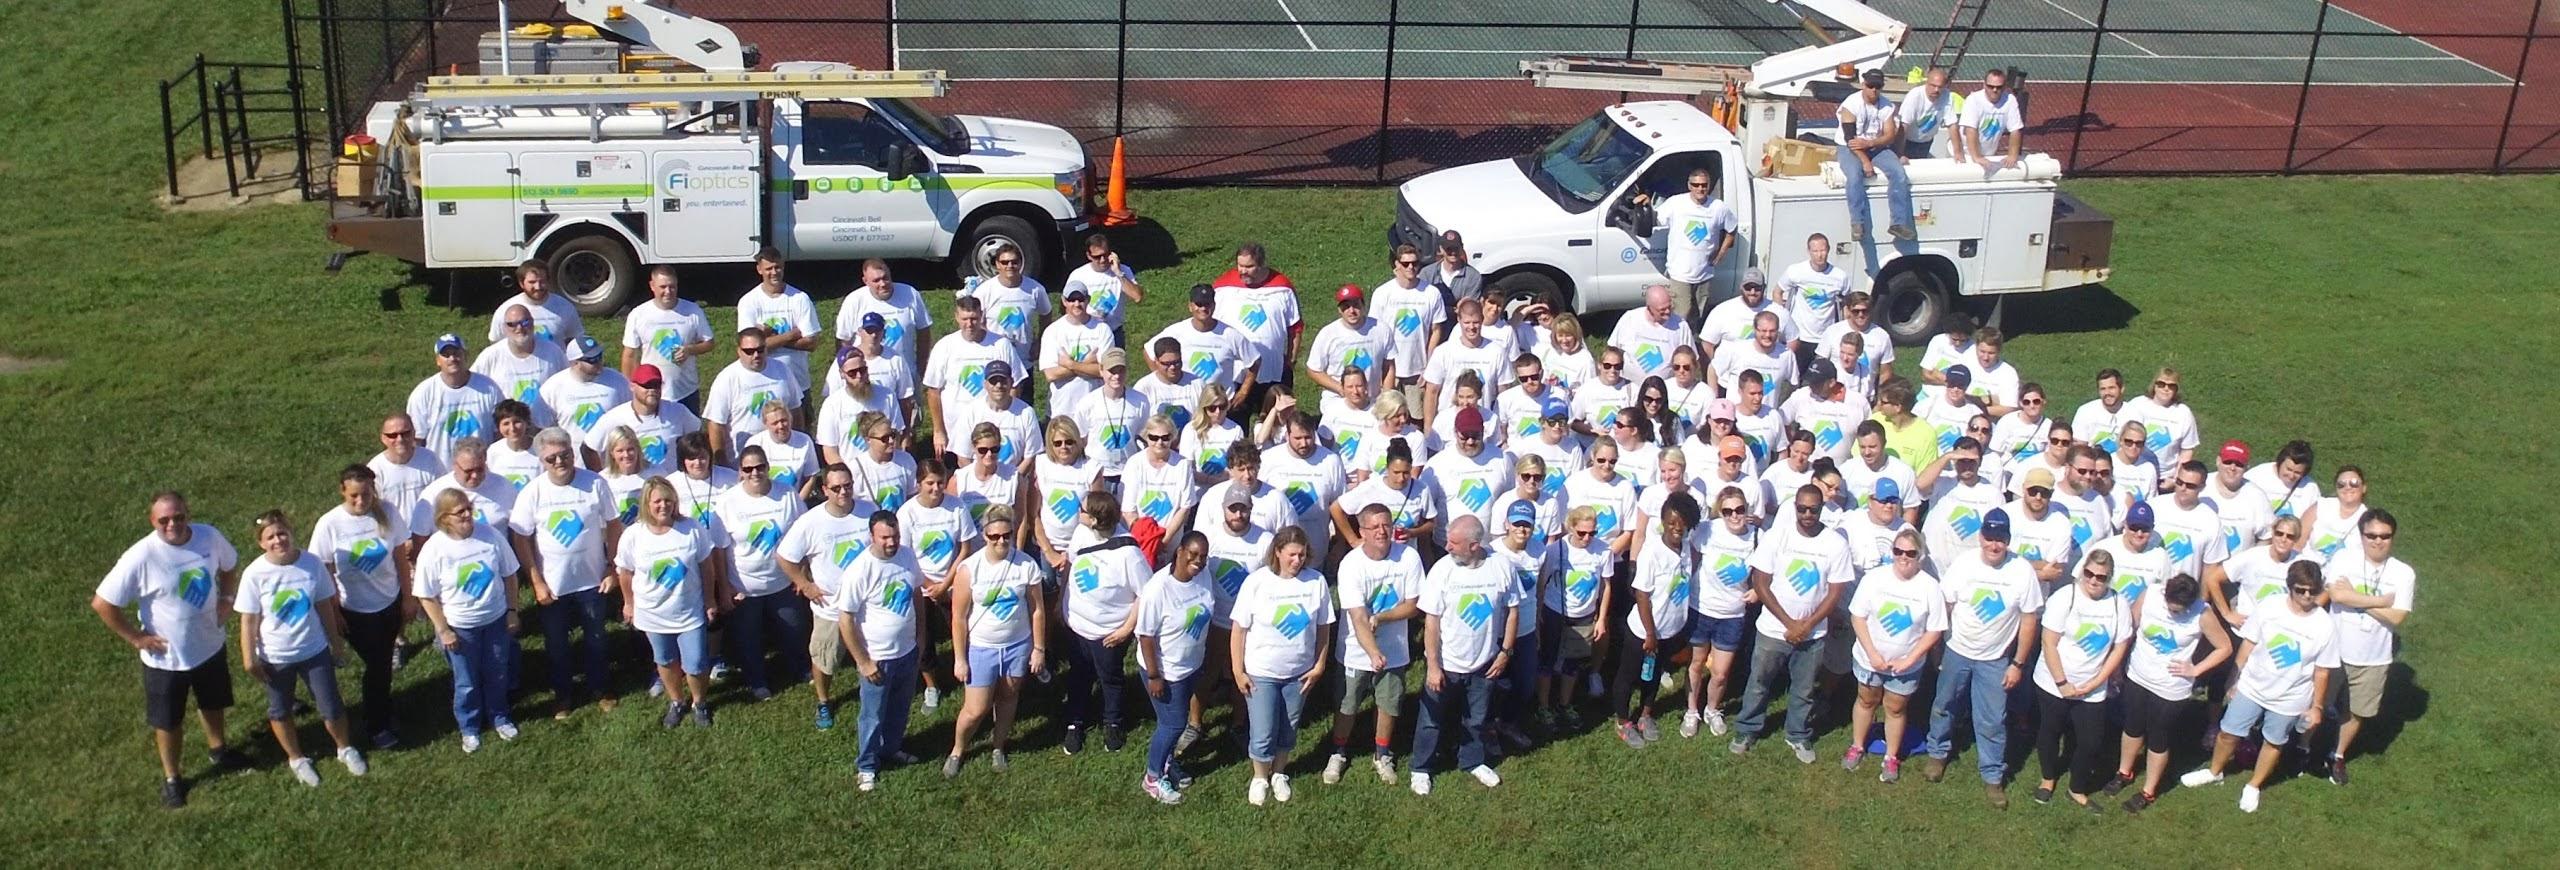 Cincinnati Bell Employees Giving Back